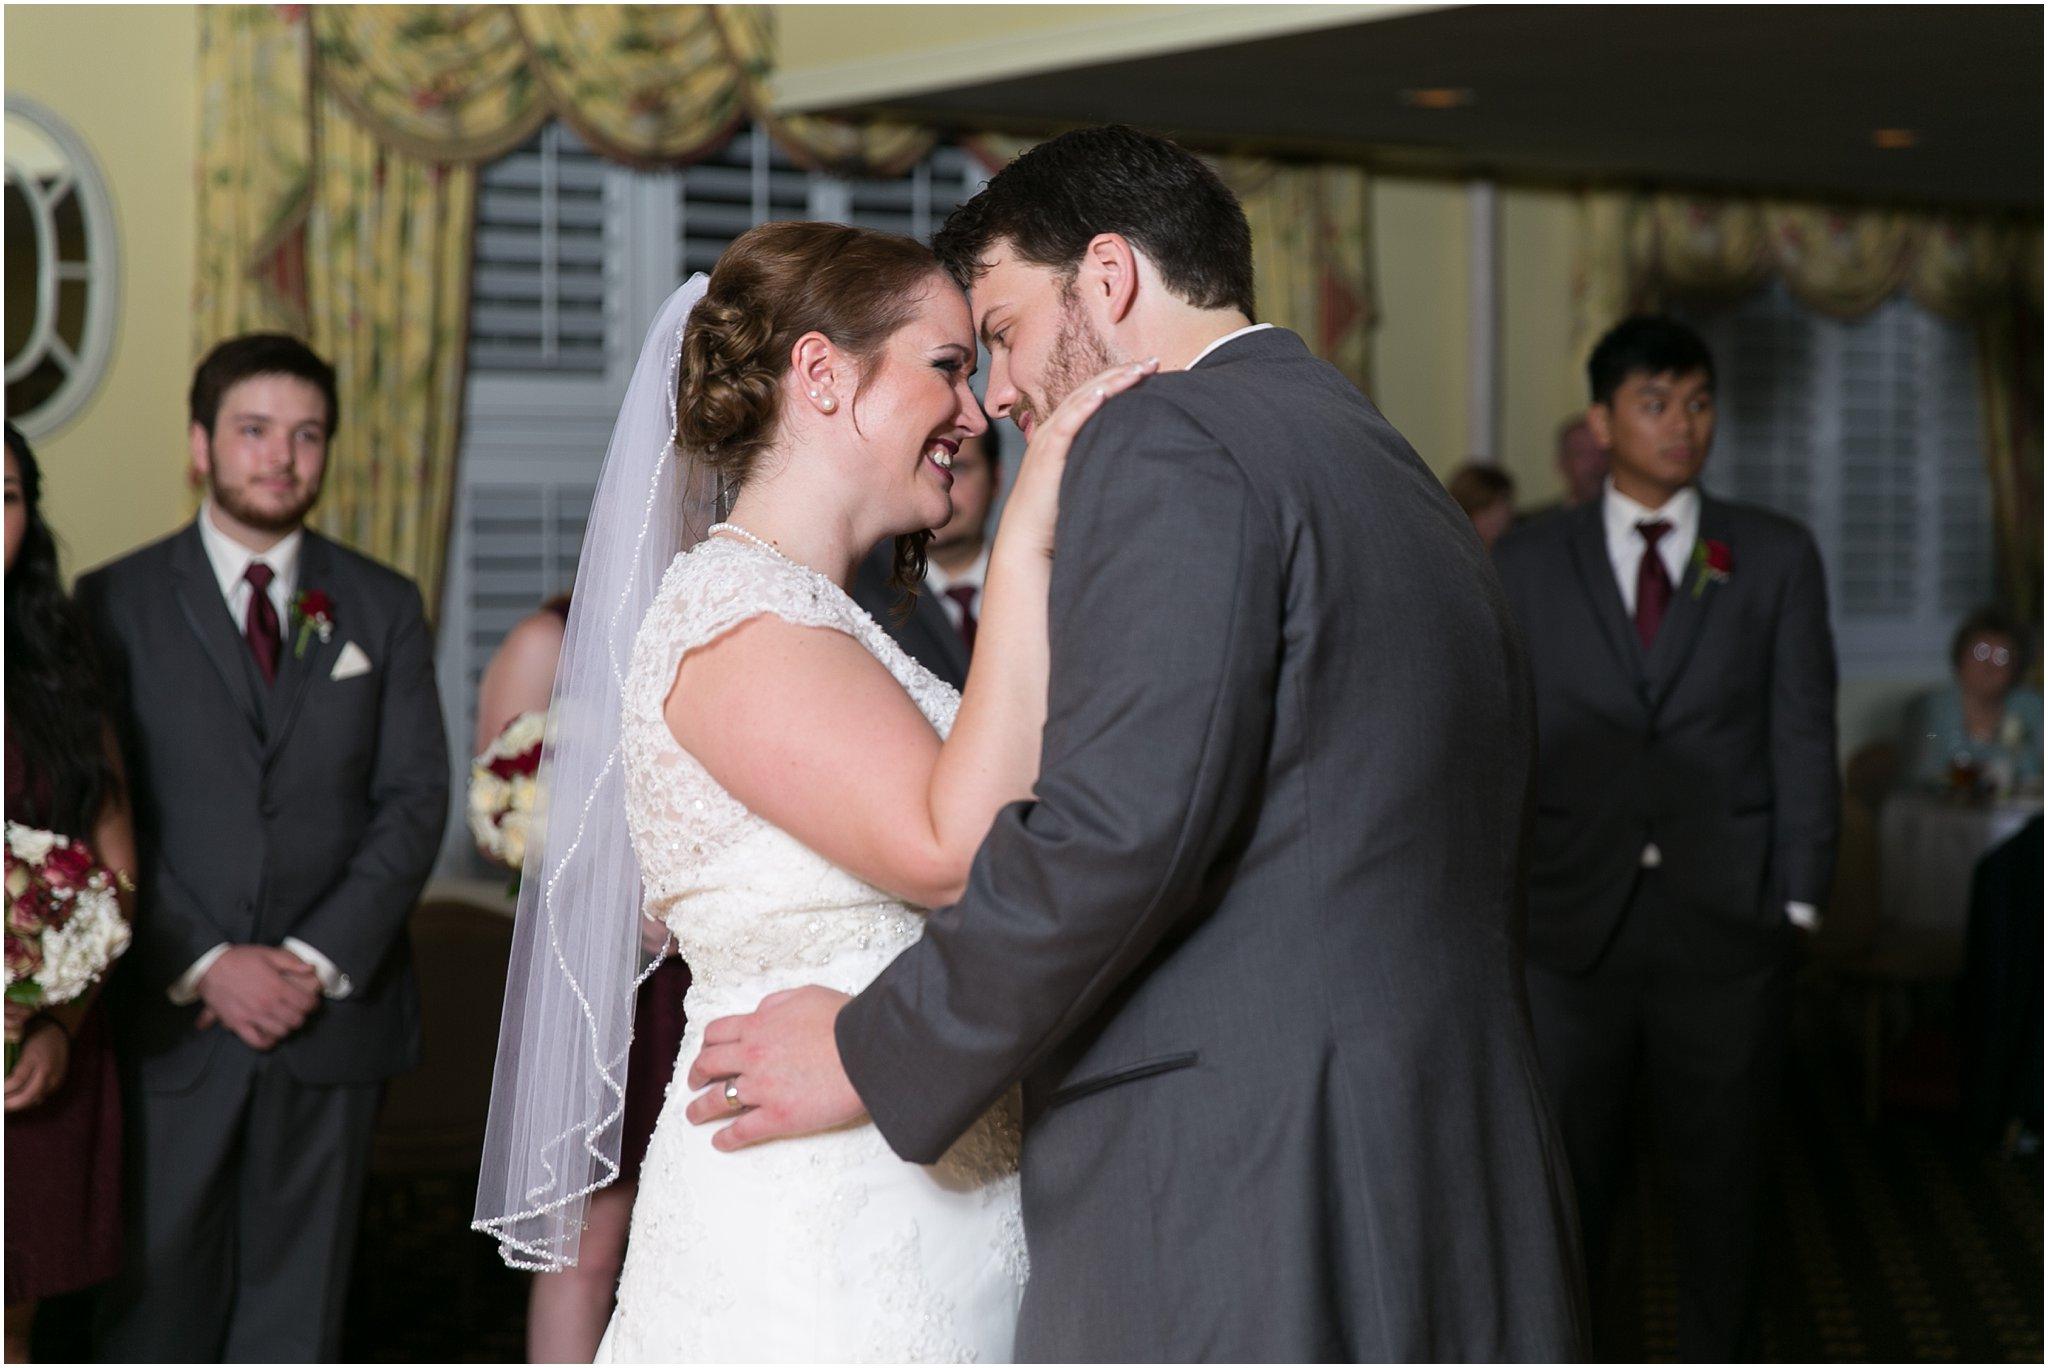 jessica_ryan_photography_wedding_hampton_roads_virginia_virginia_beach_weddings_0628